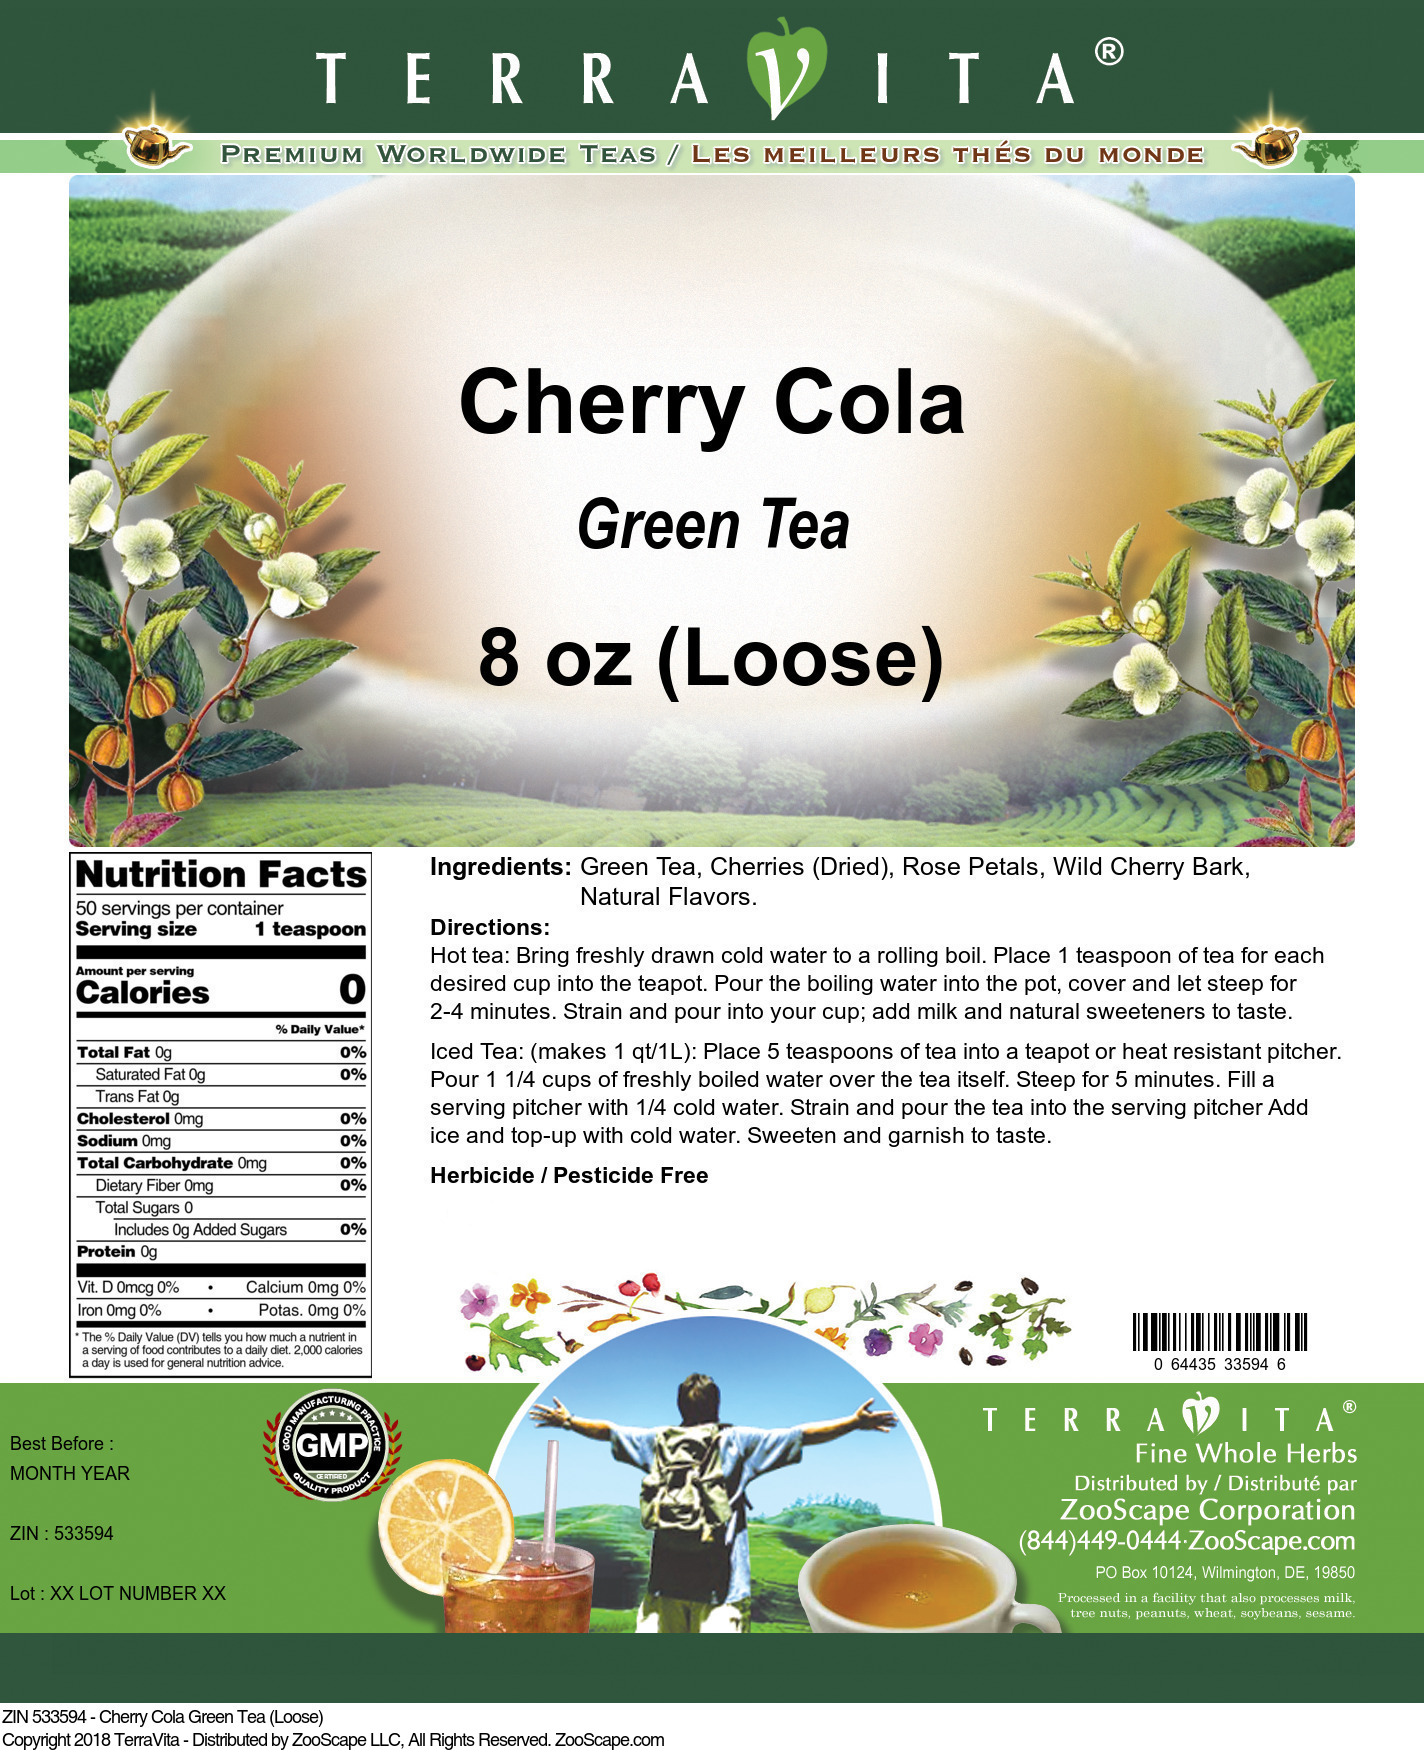 Cherry Cola Green Tea (Loose)